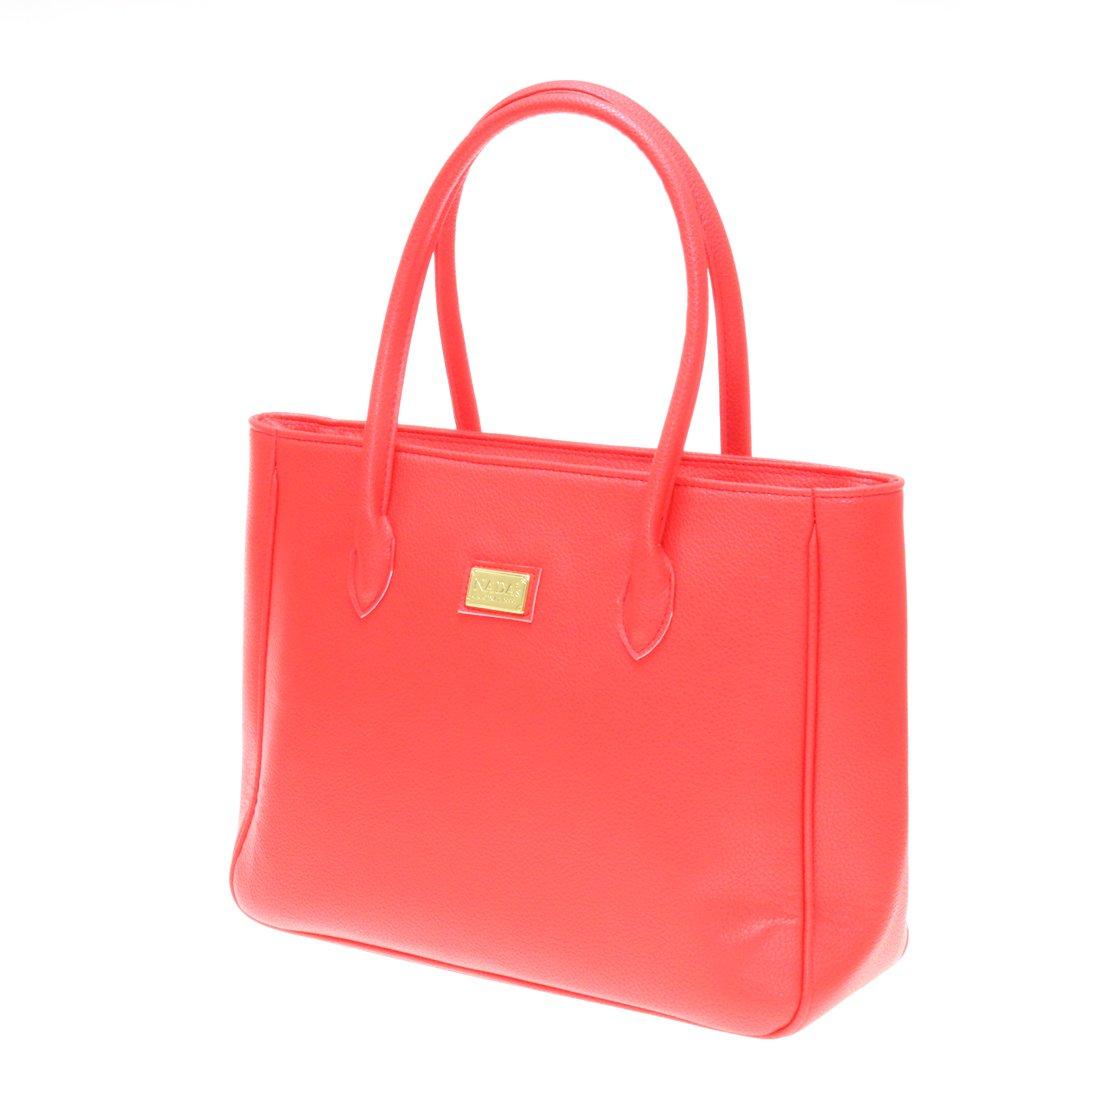 Twinya Women's PU Leather Handbags Tote Hobo Beautiful Top Handle Satchel Medium Red